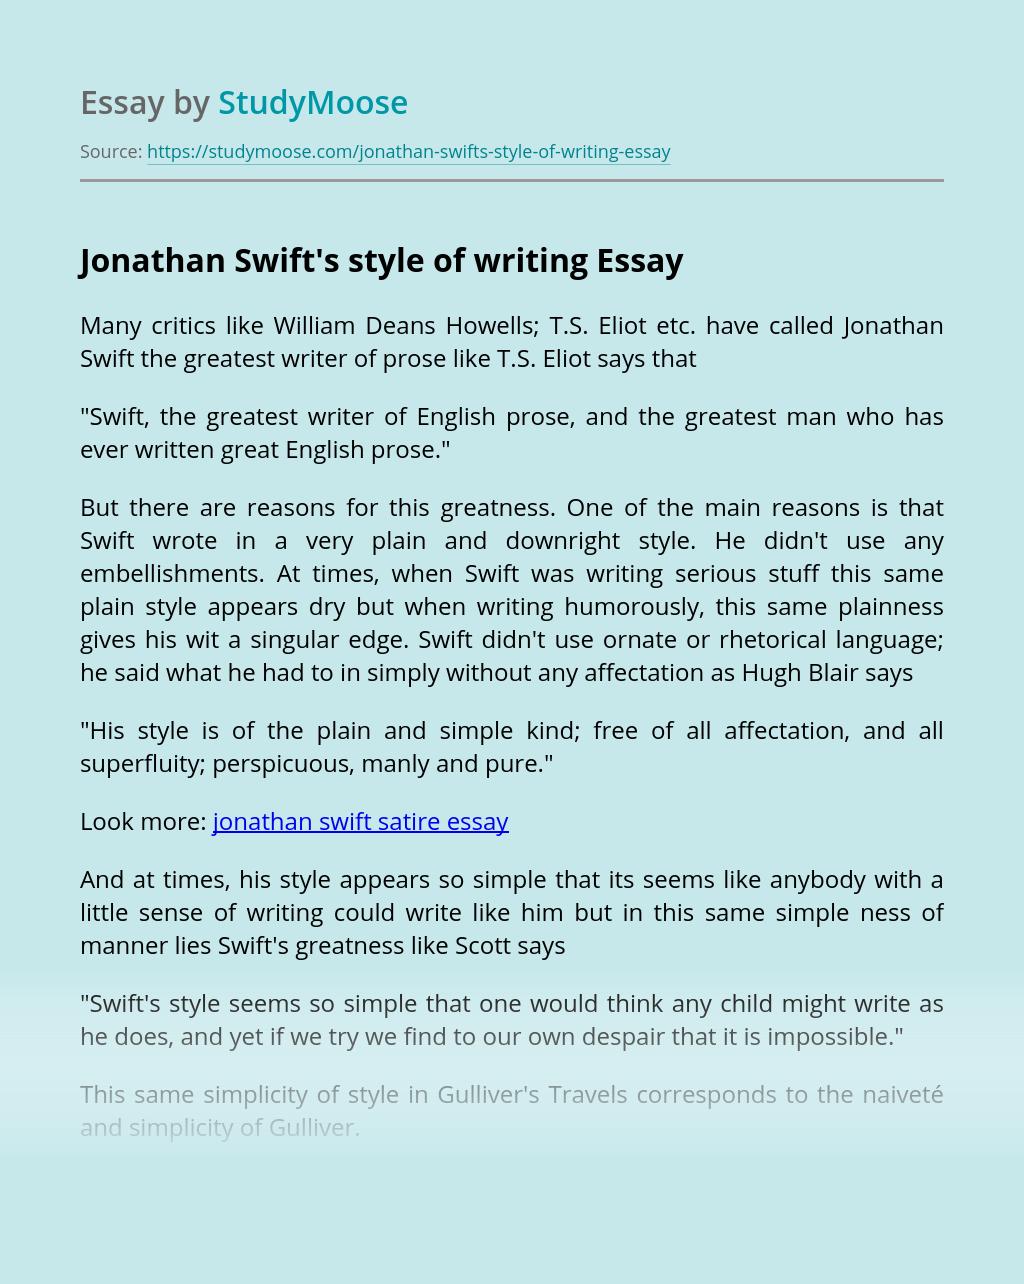 Style essay man essay on akshay urja diwas